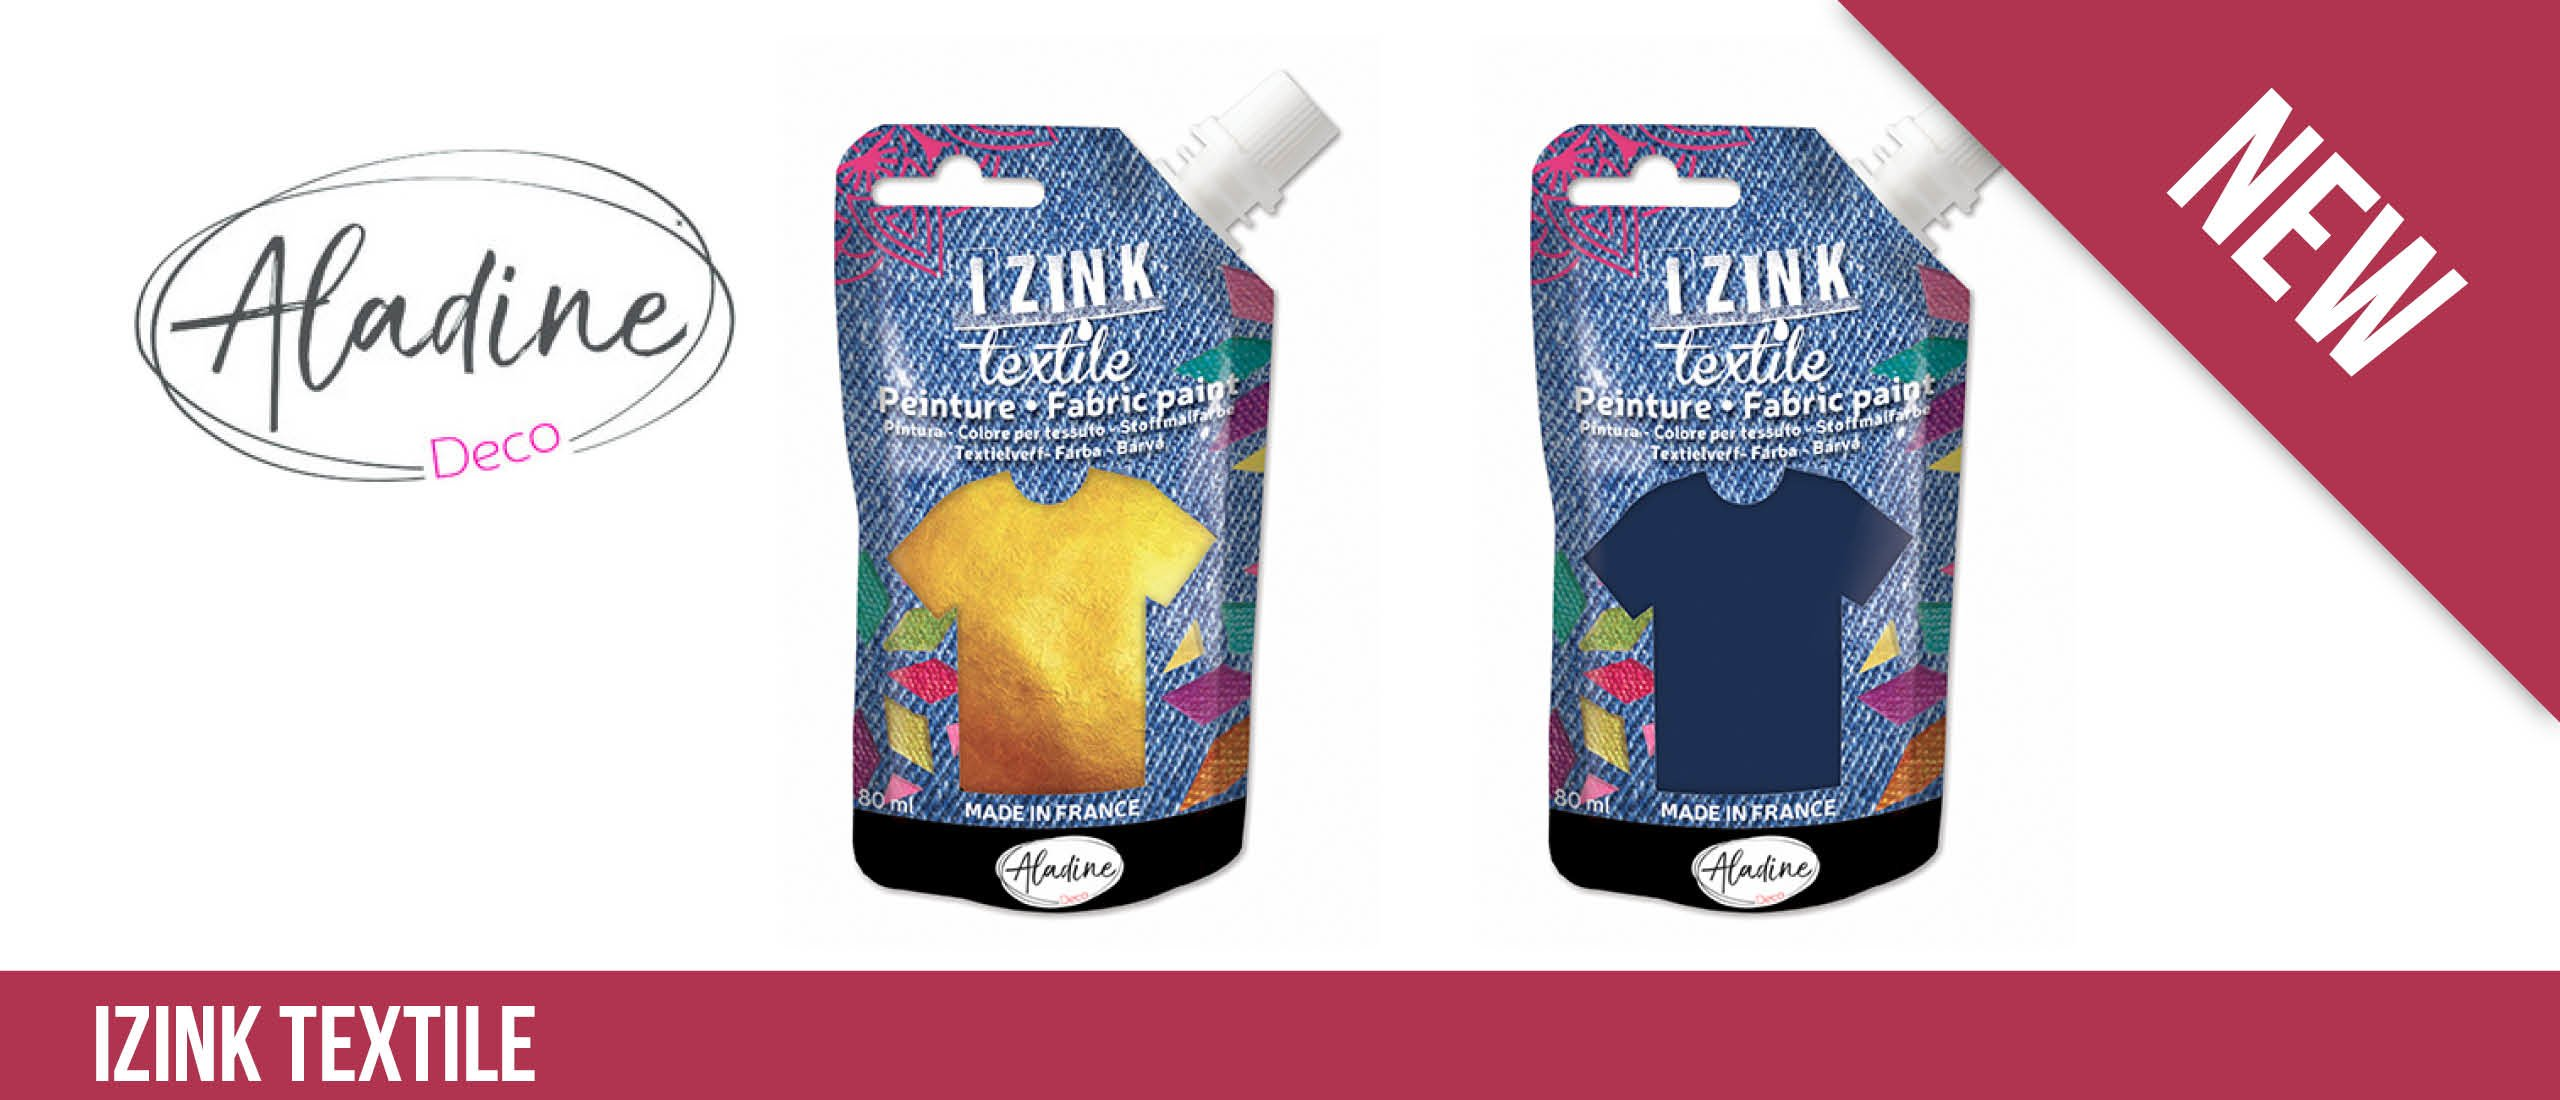 Textile Fabric Paint Paste Izink van Aladine